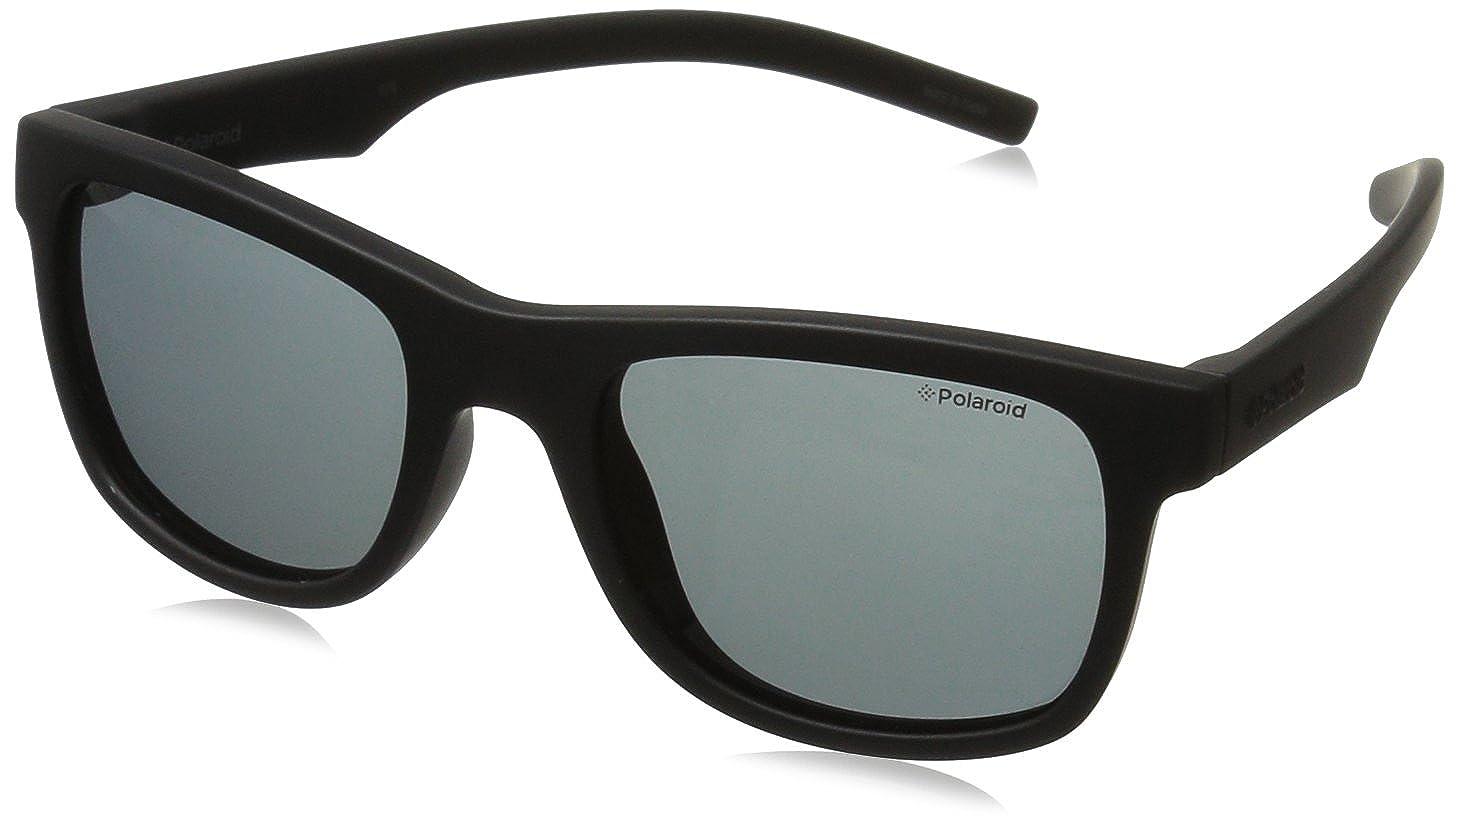 42a7b3cd3c4 Polaroid Kids  PLD 8020 S Y2 YYV Sunglasses